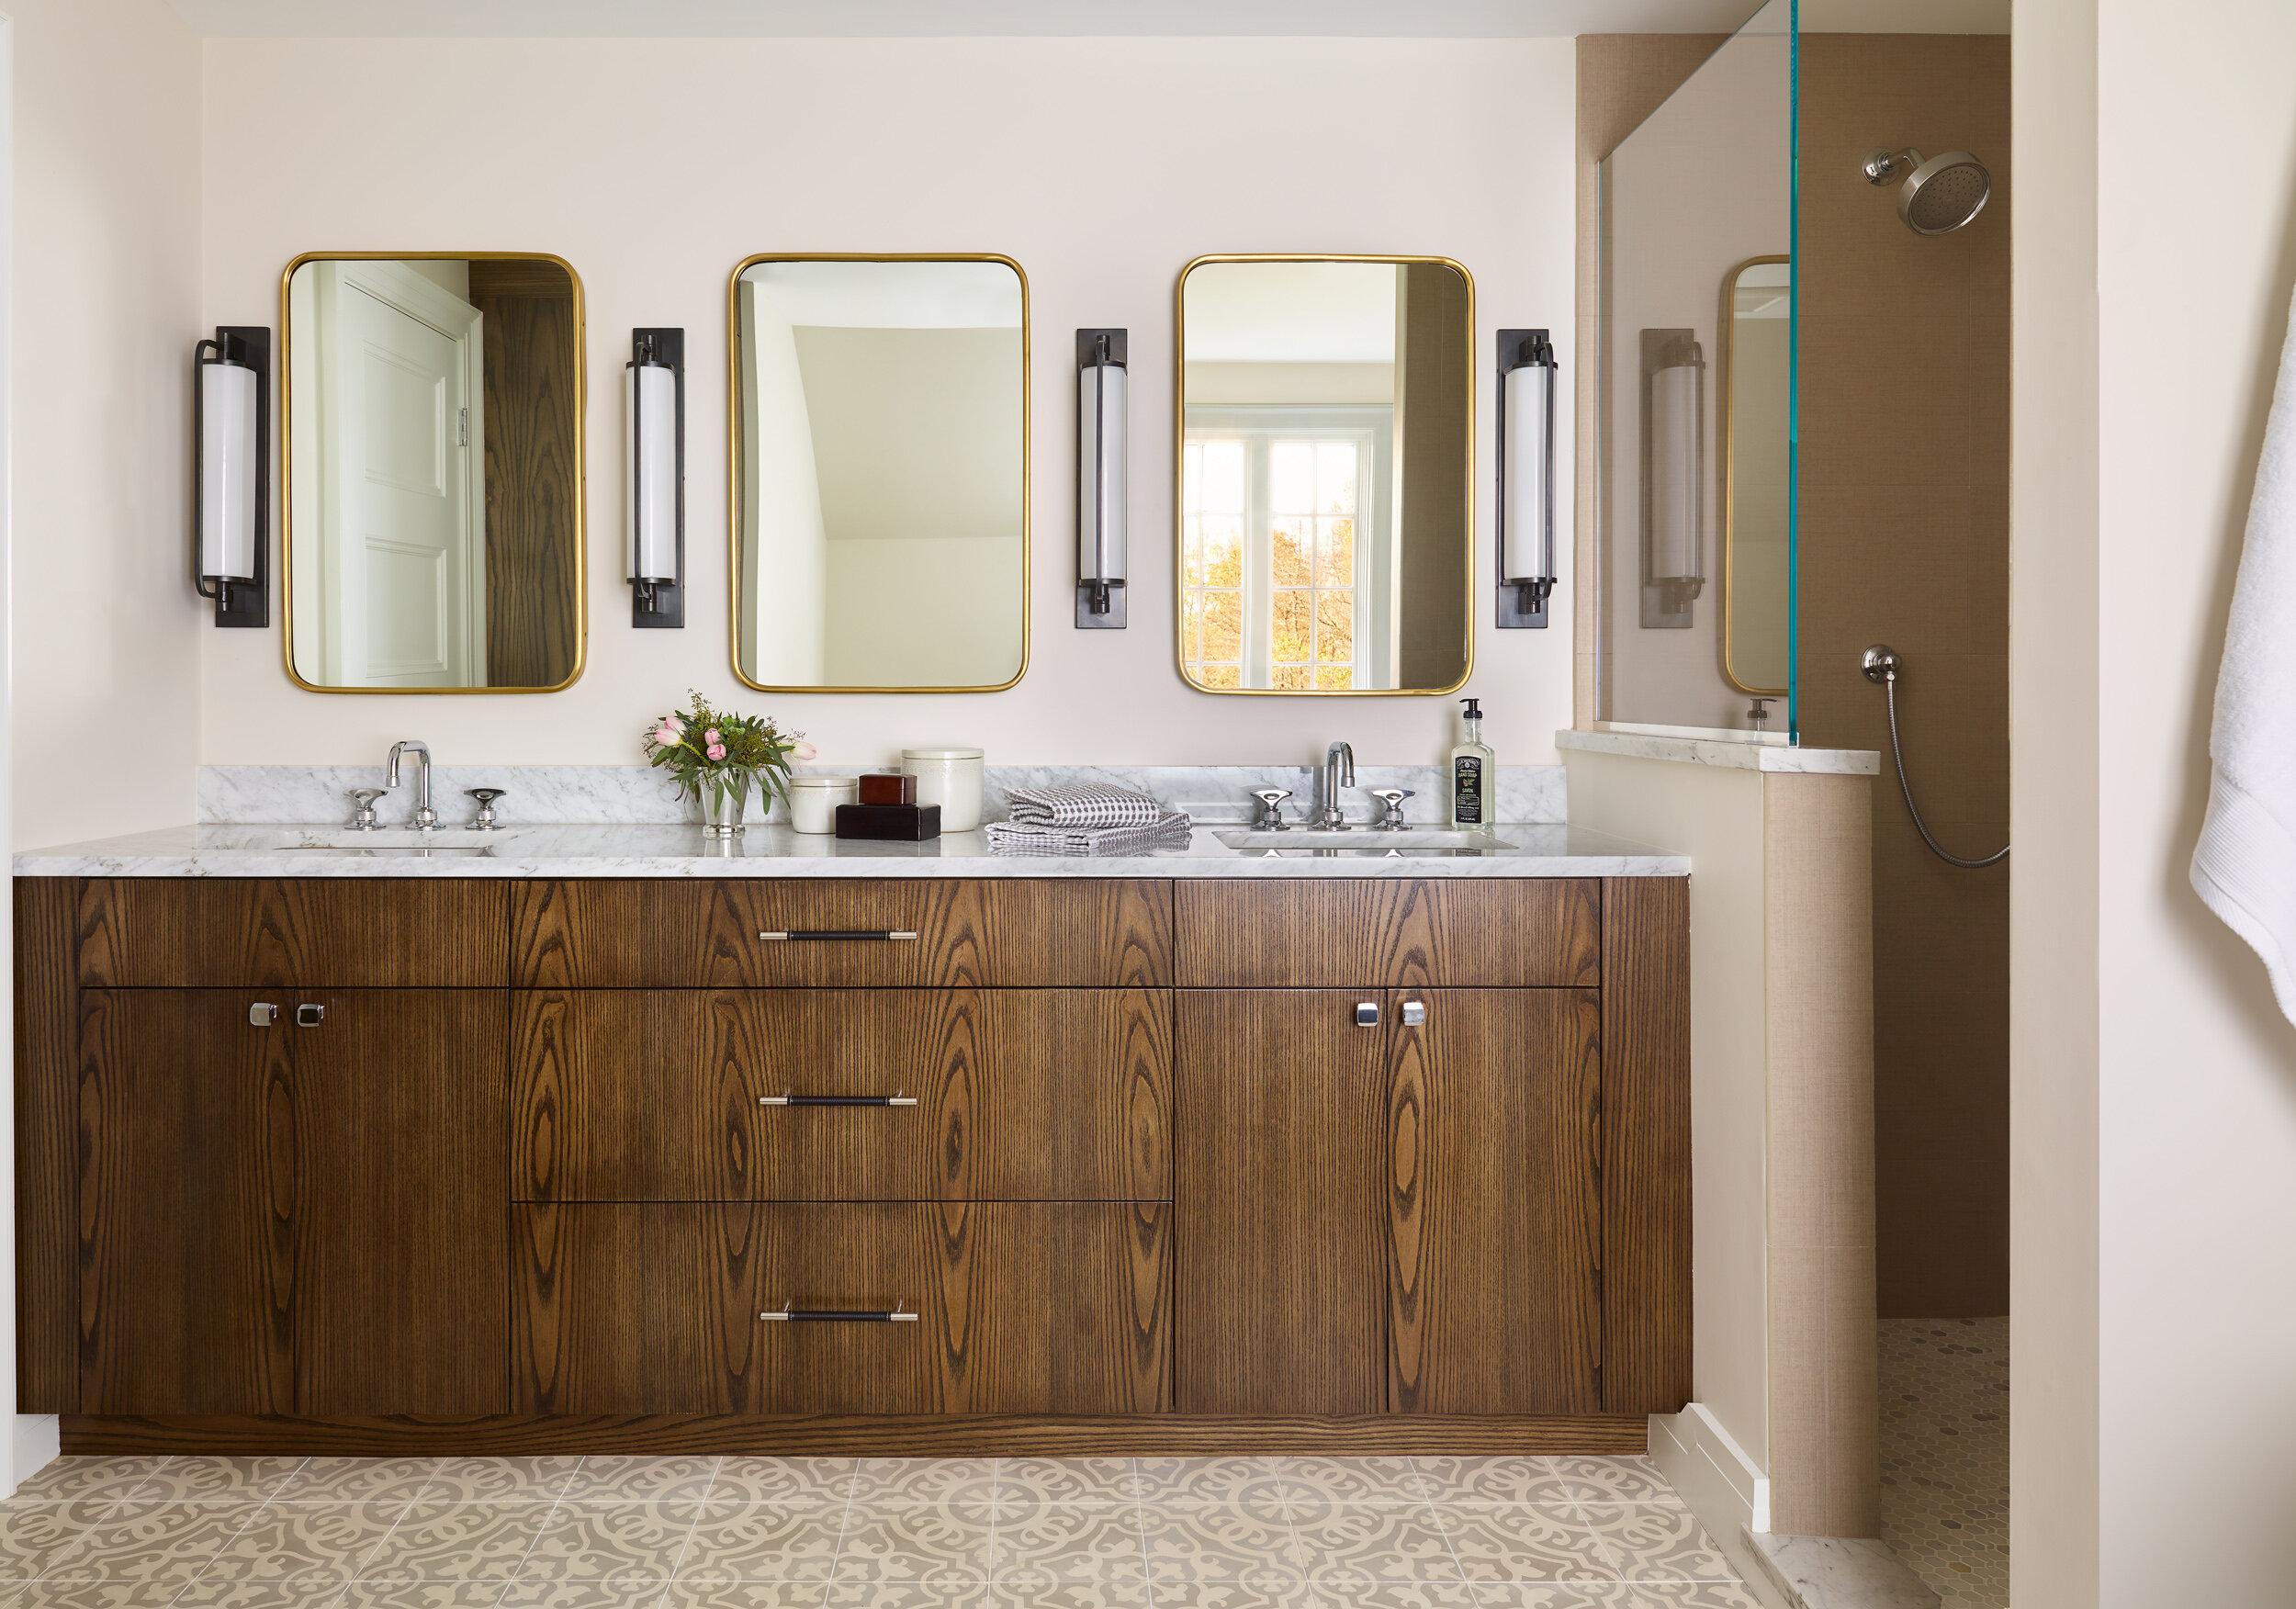 mackenzie-and-company-boston-interior-design-master-bathroom-style-1